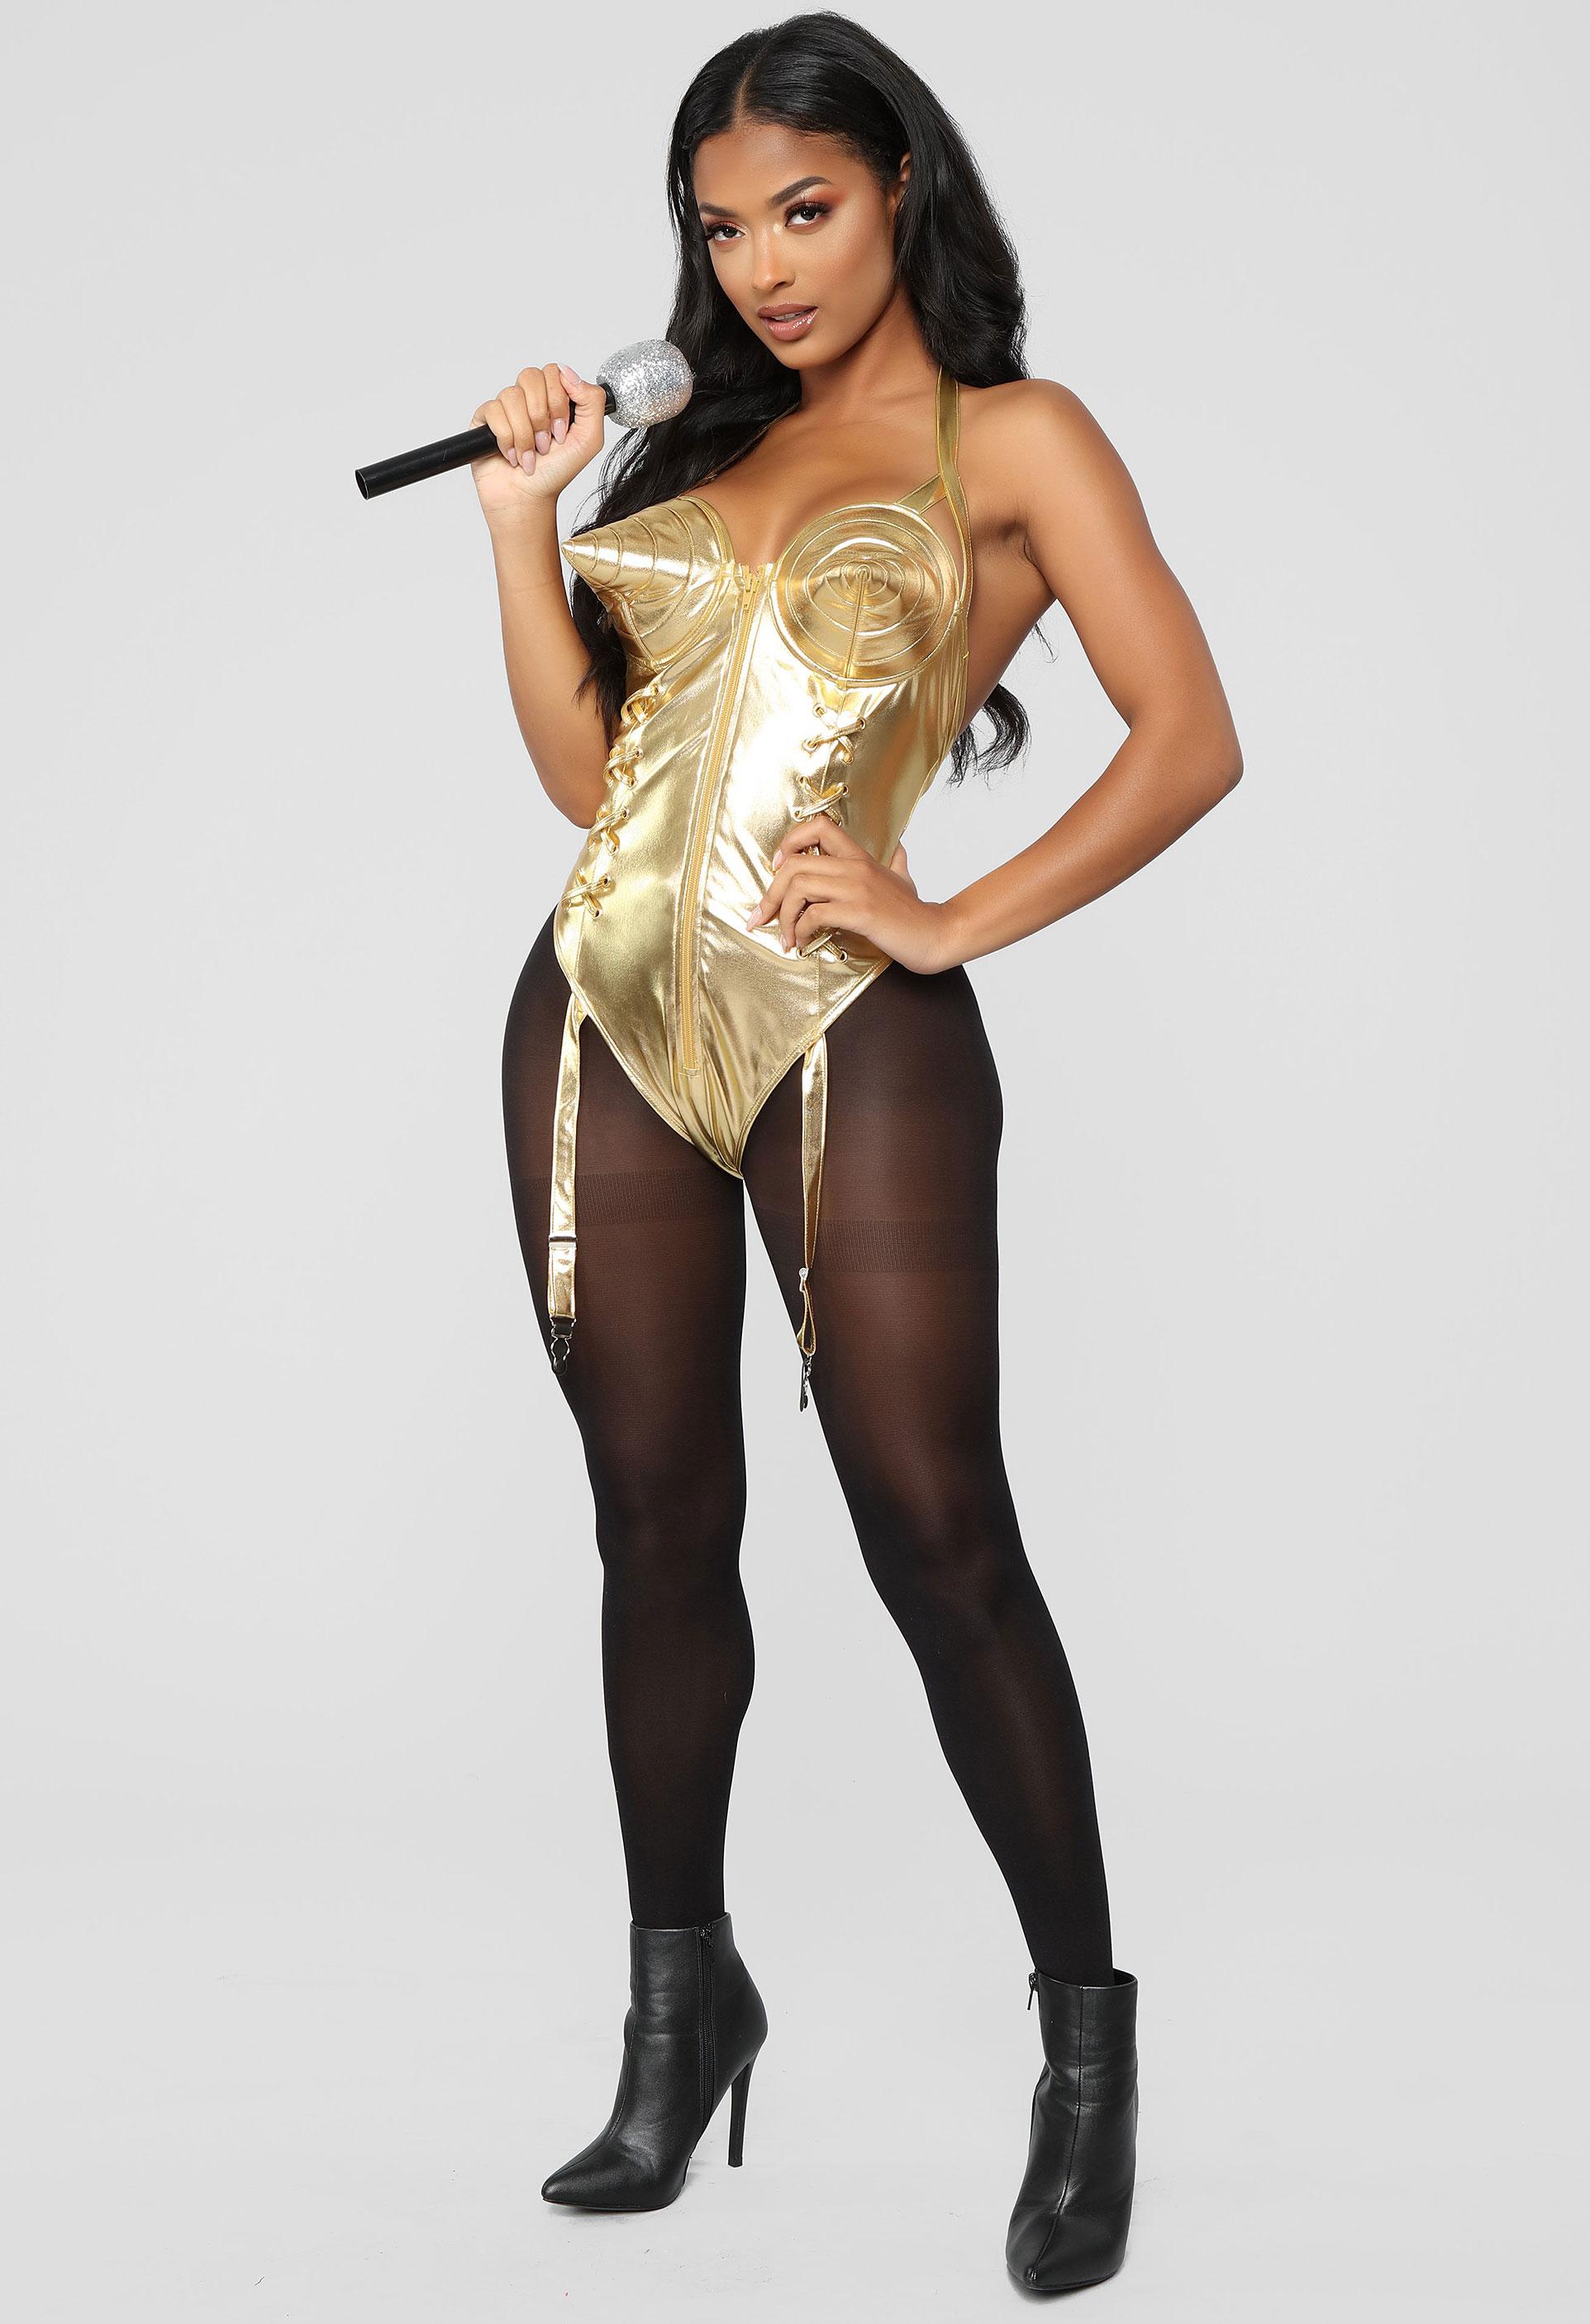 Fashion Nova Celebrity Halloween 2019 Costumes Pics